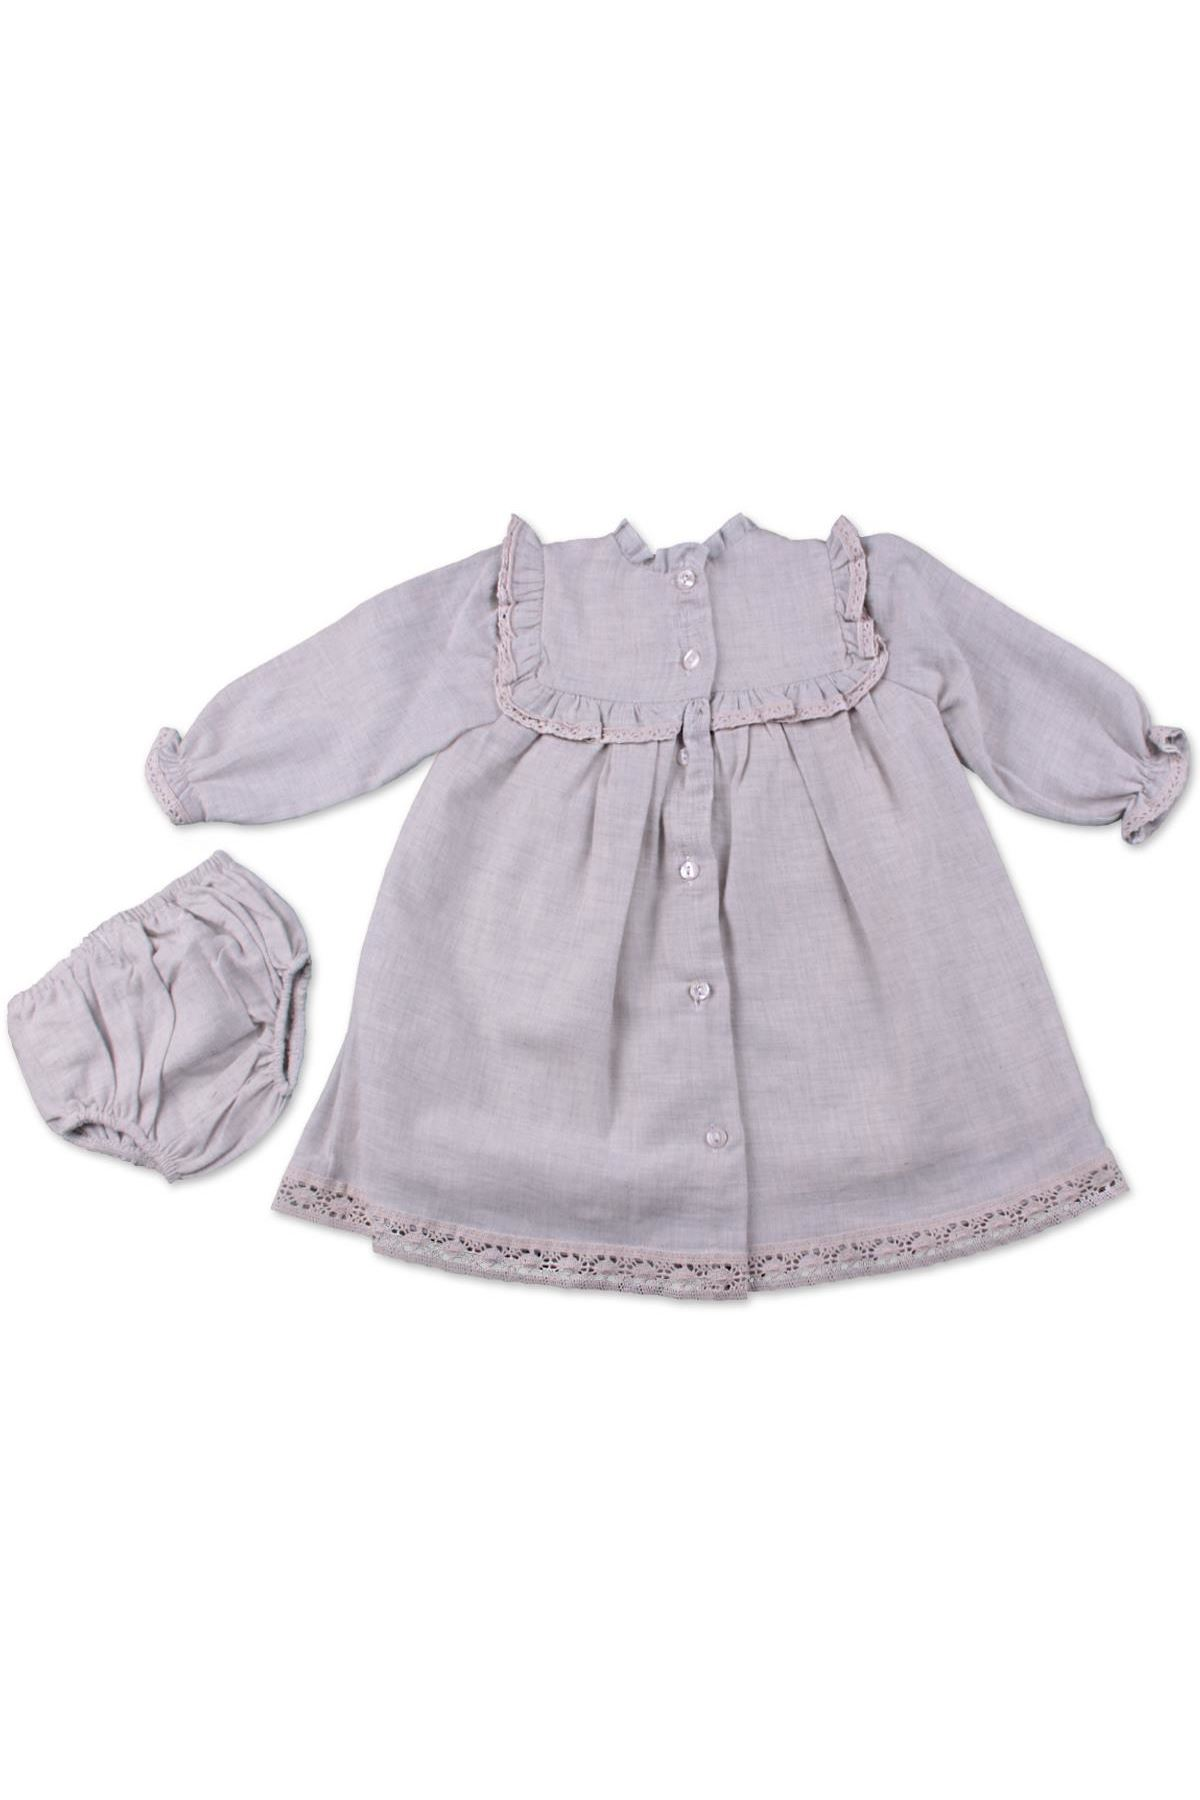 Babydola Elbise Set 40078 Gri